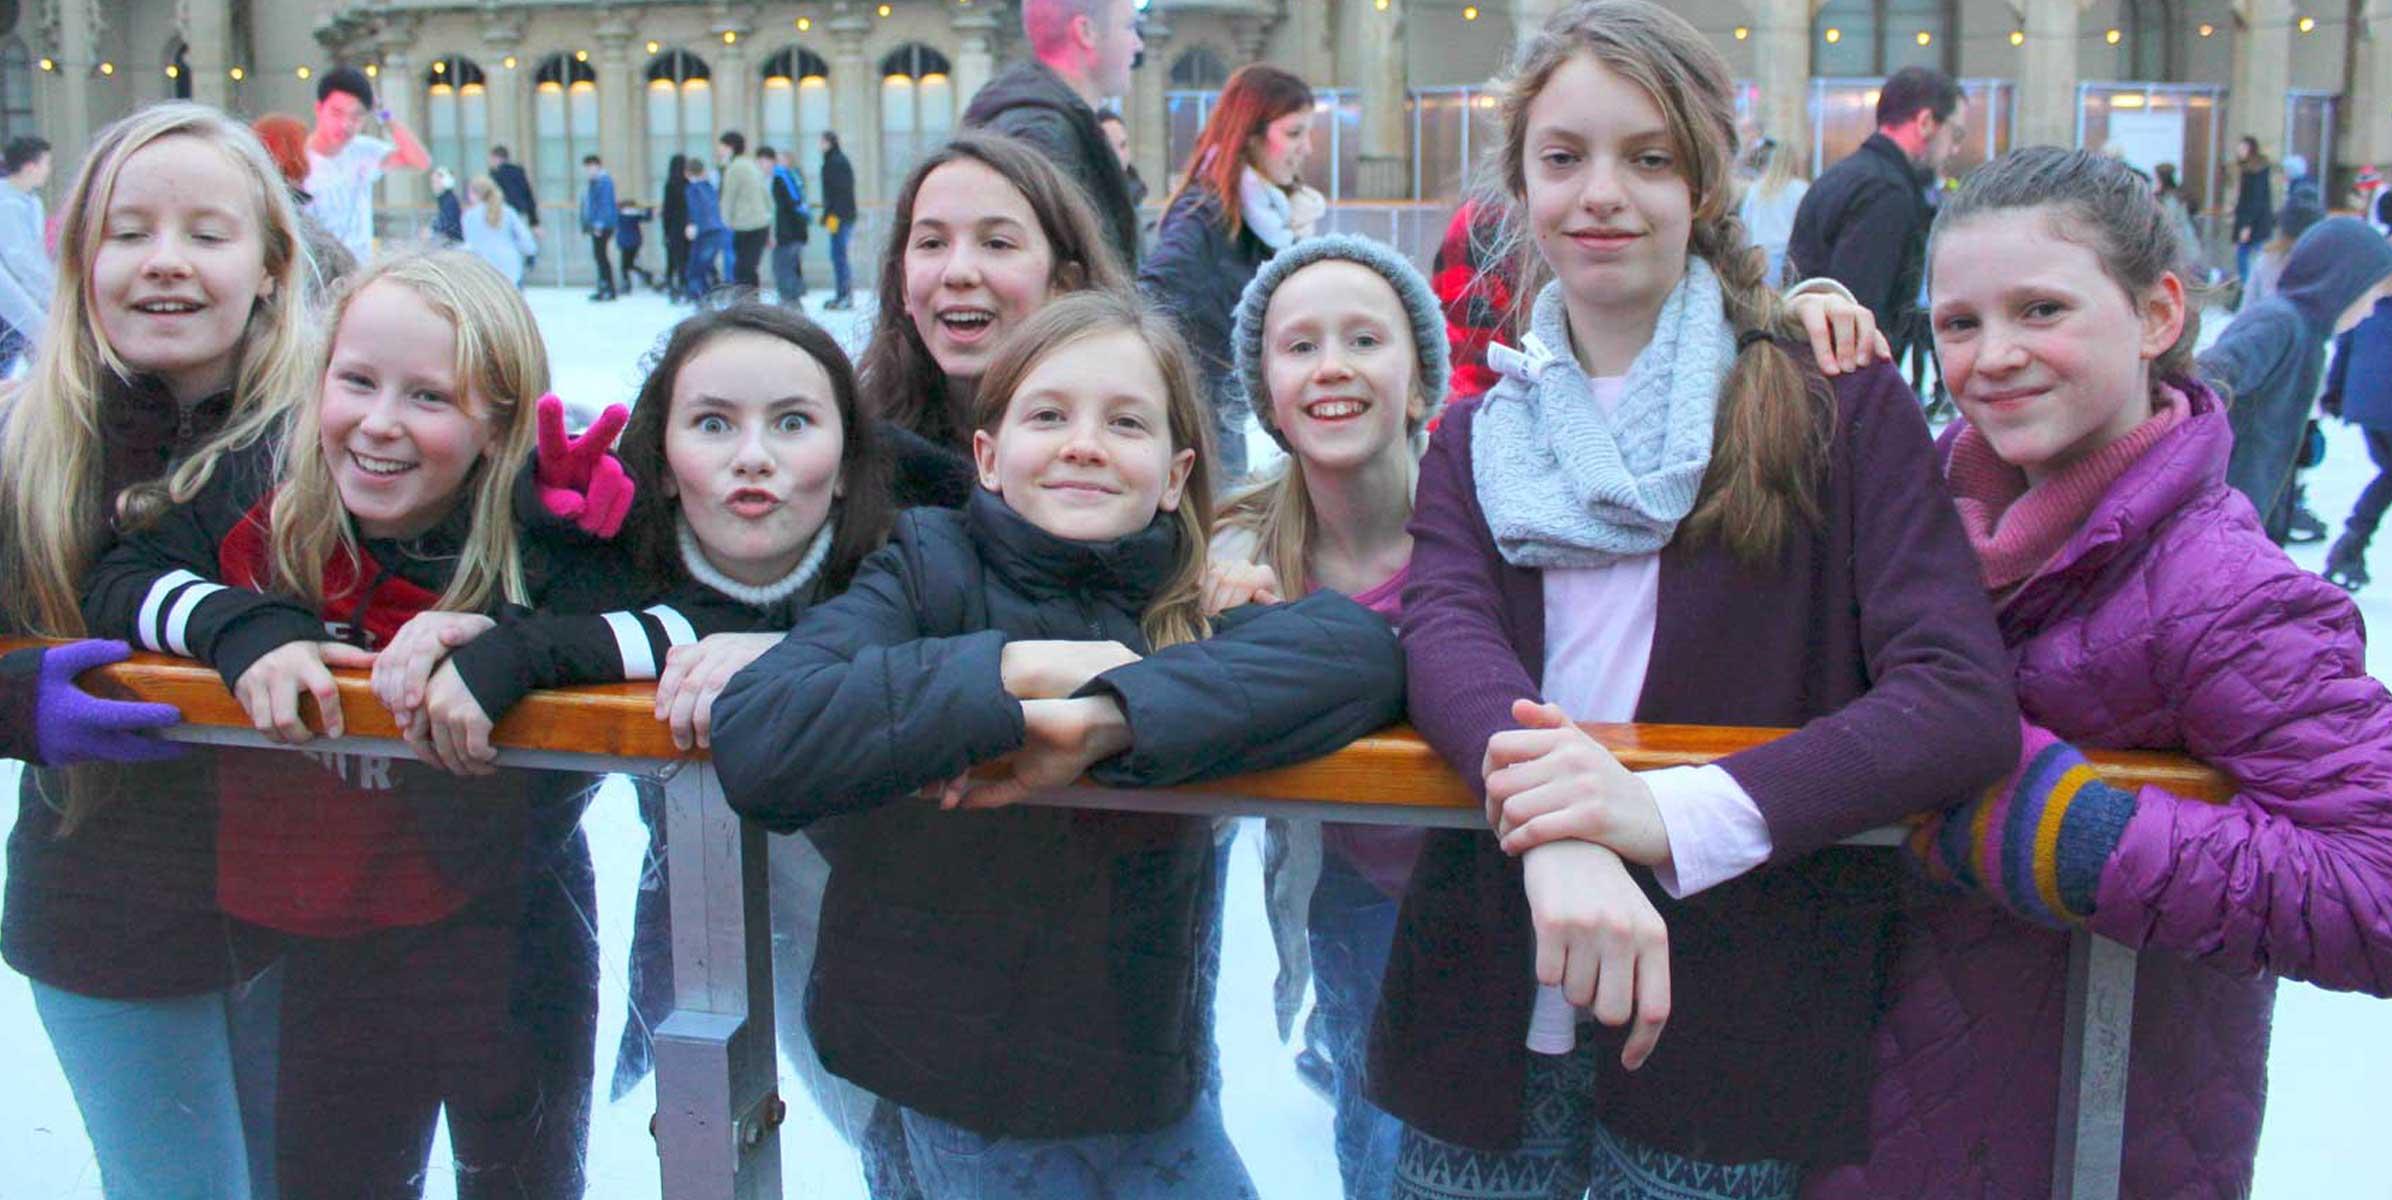 Of girls group 400+ Fantastic